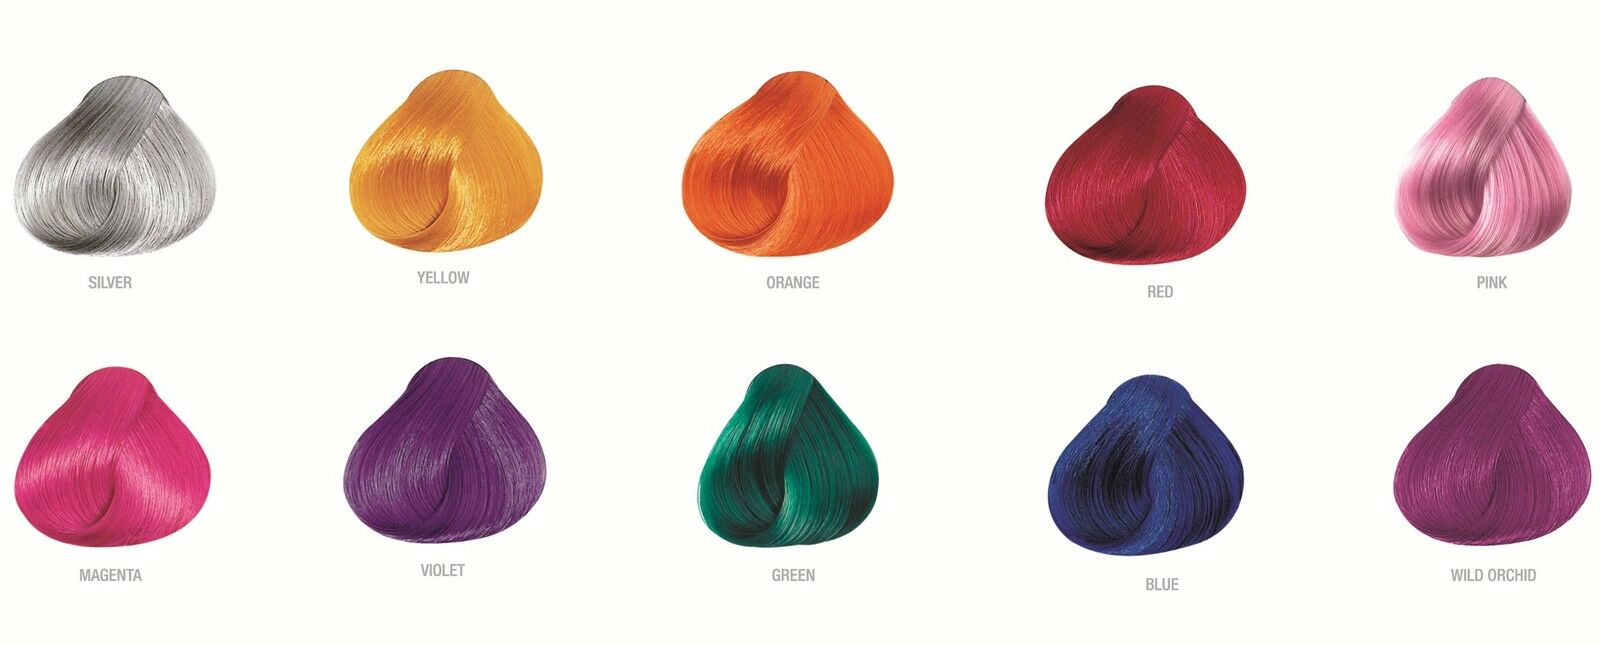 Pravana Vivids Color Chart Ibovnathandedecker